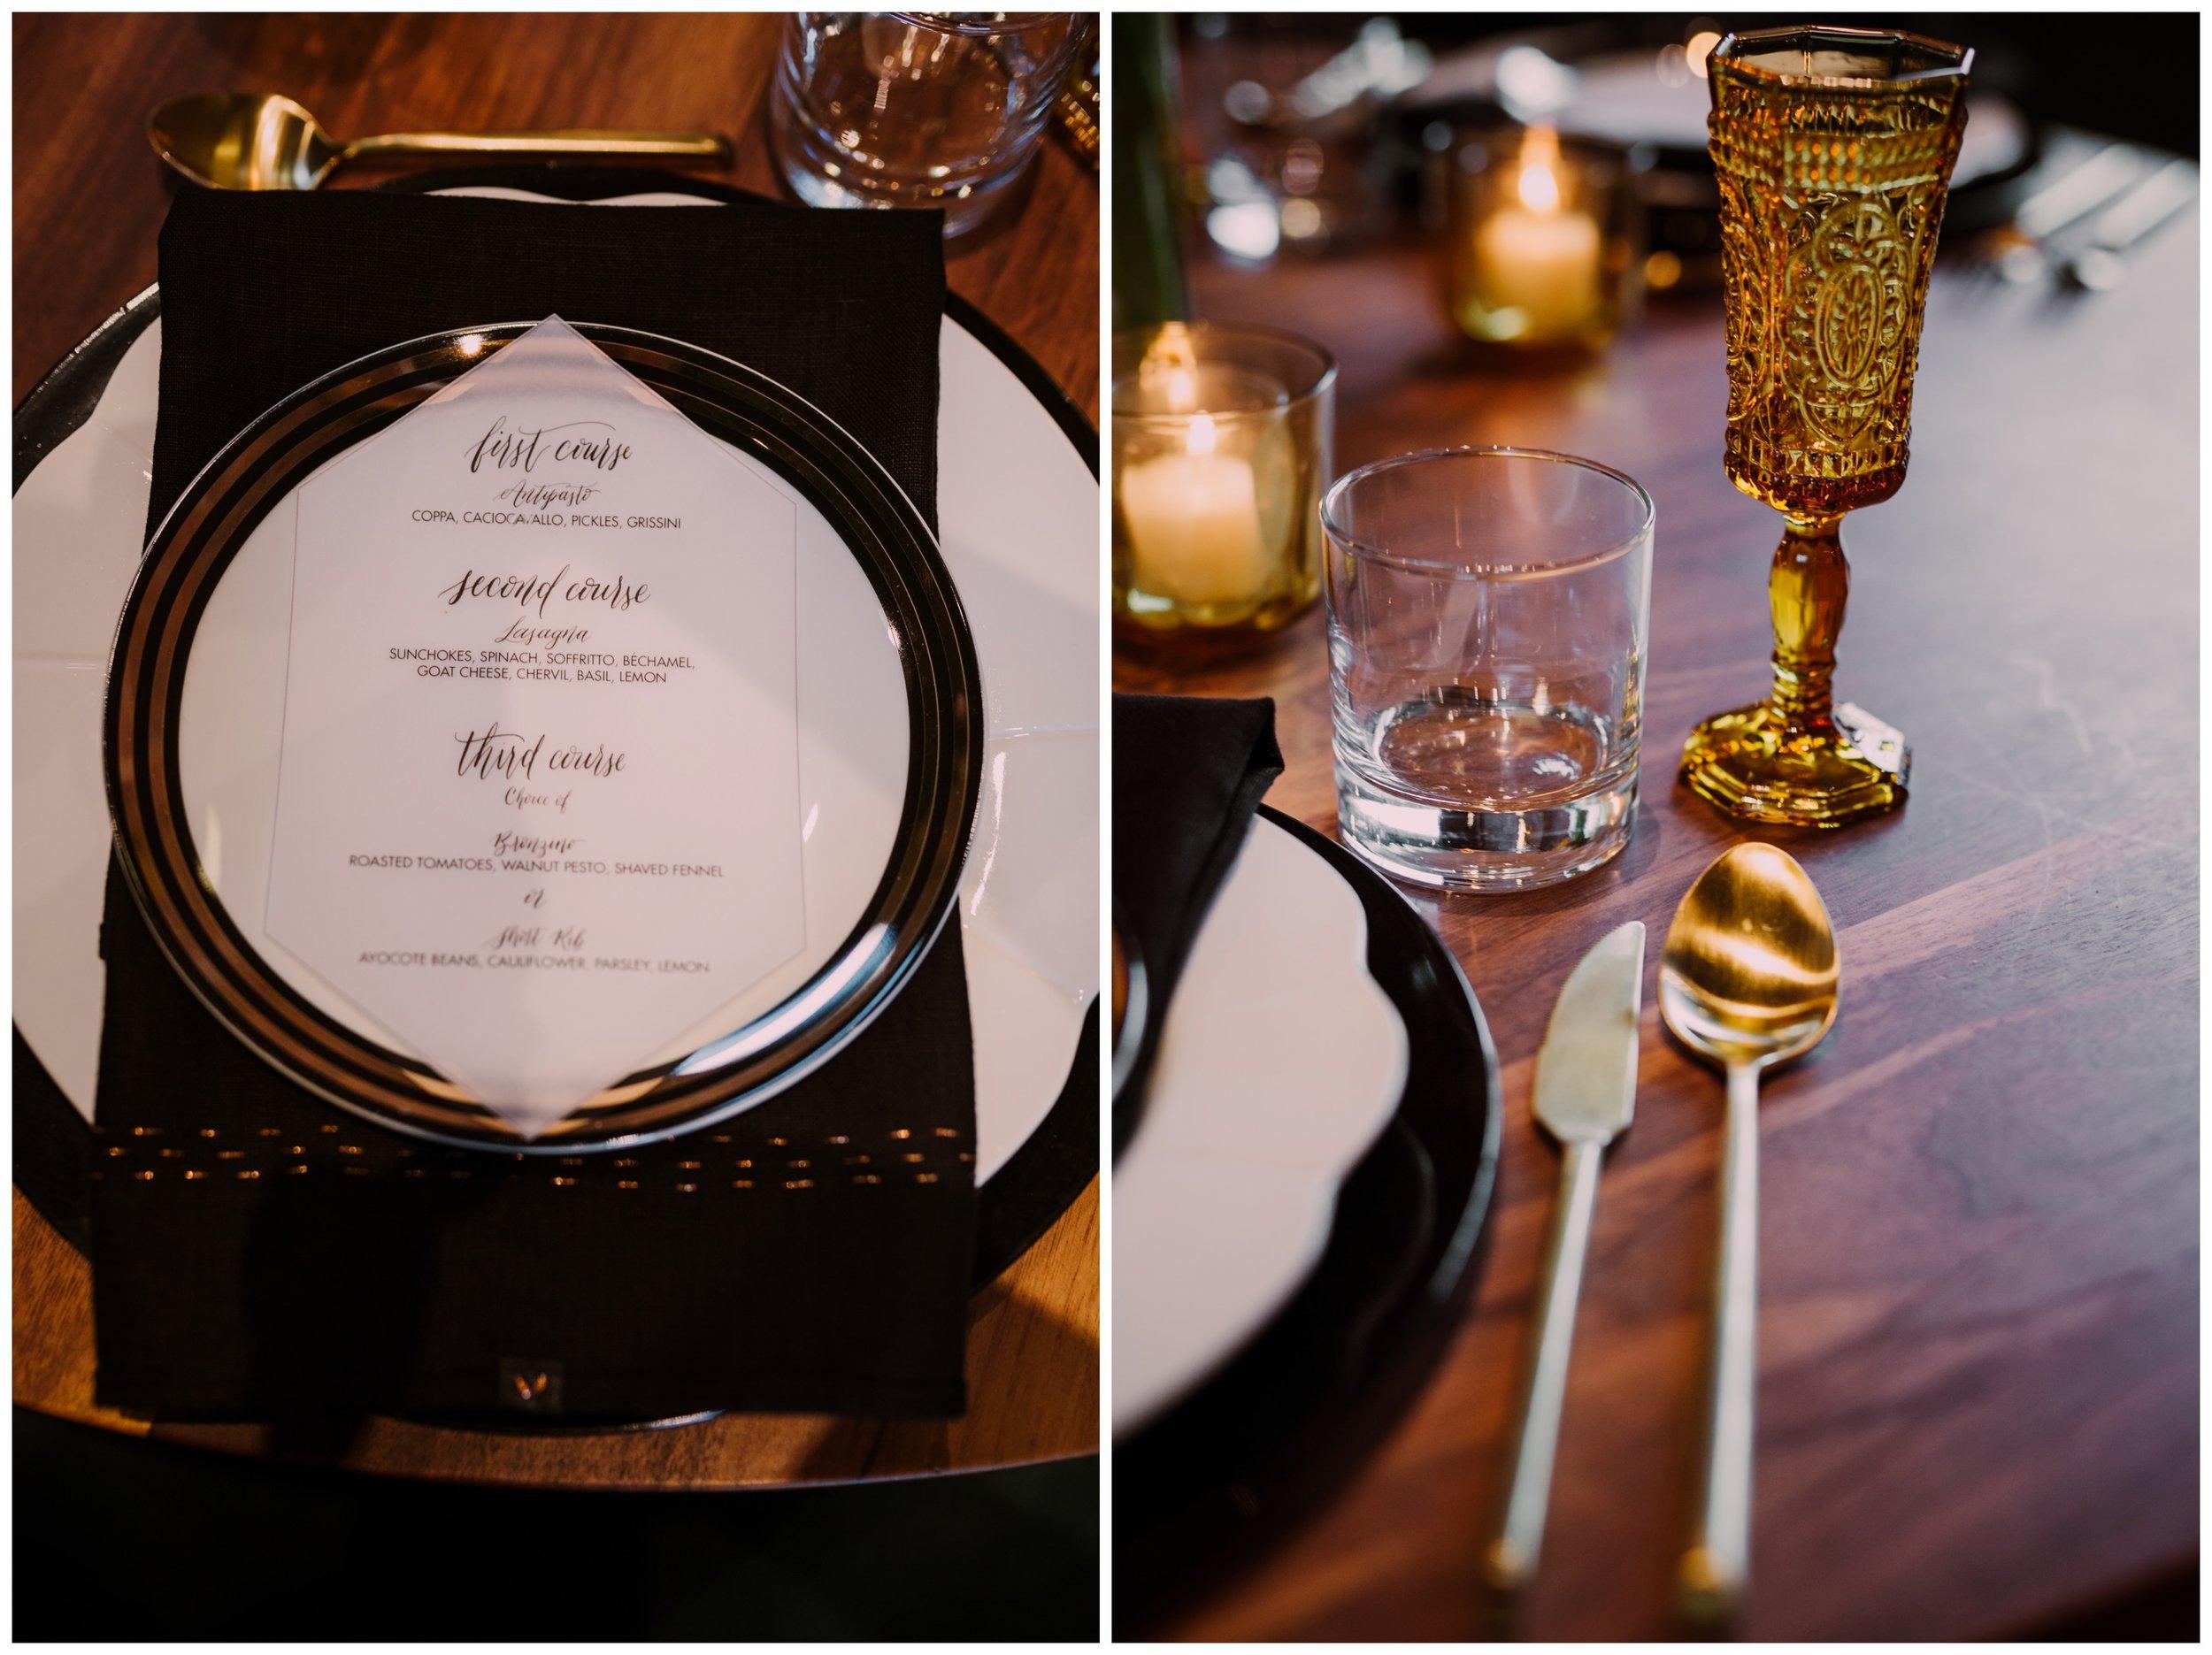 Williamsburg Hotel Wedding Feature on Catalyst Wedding Co. | Styled Shoot